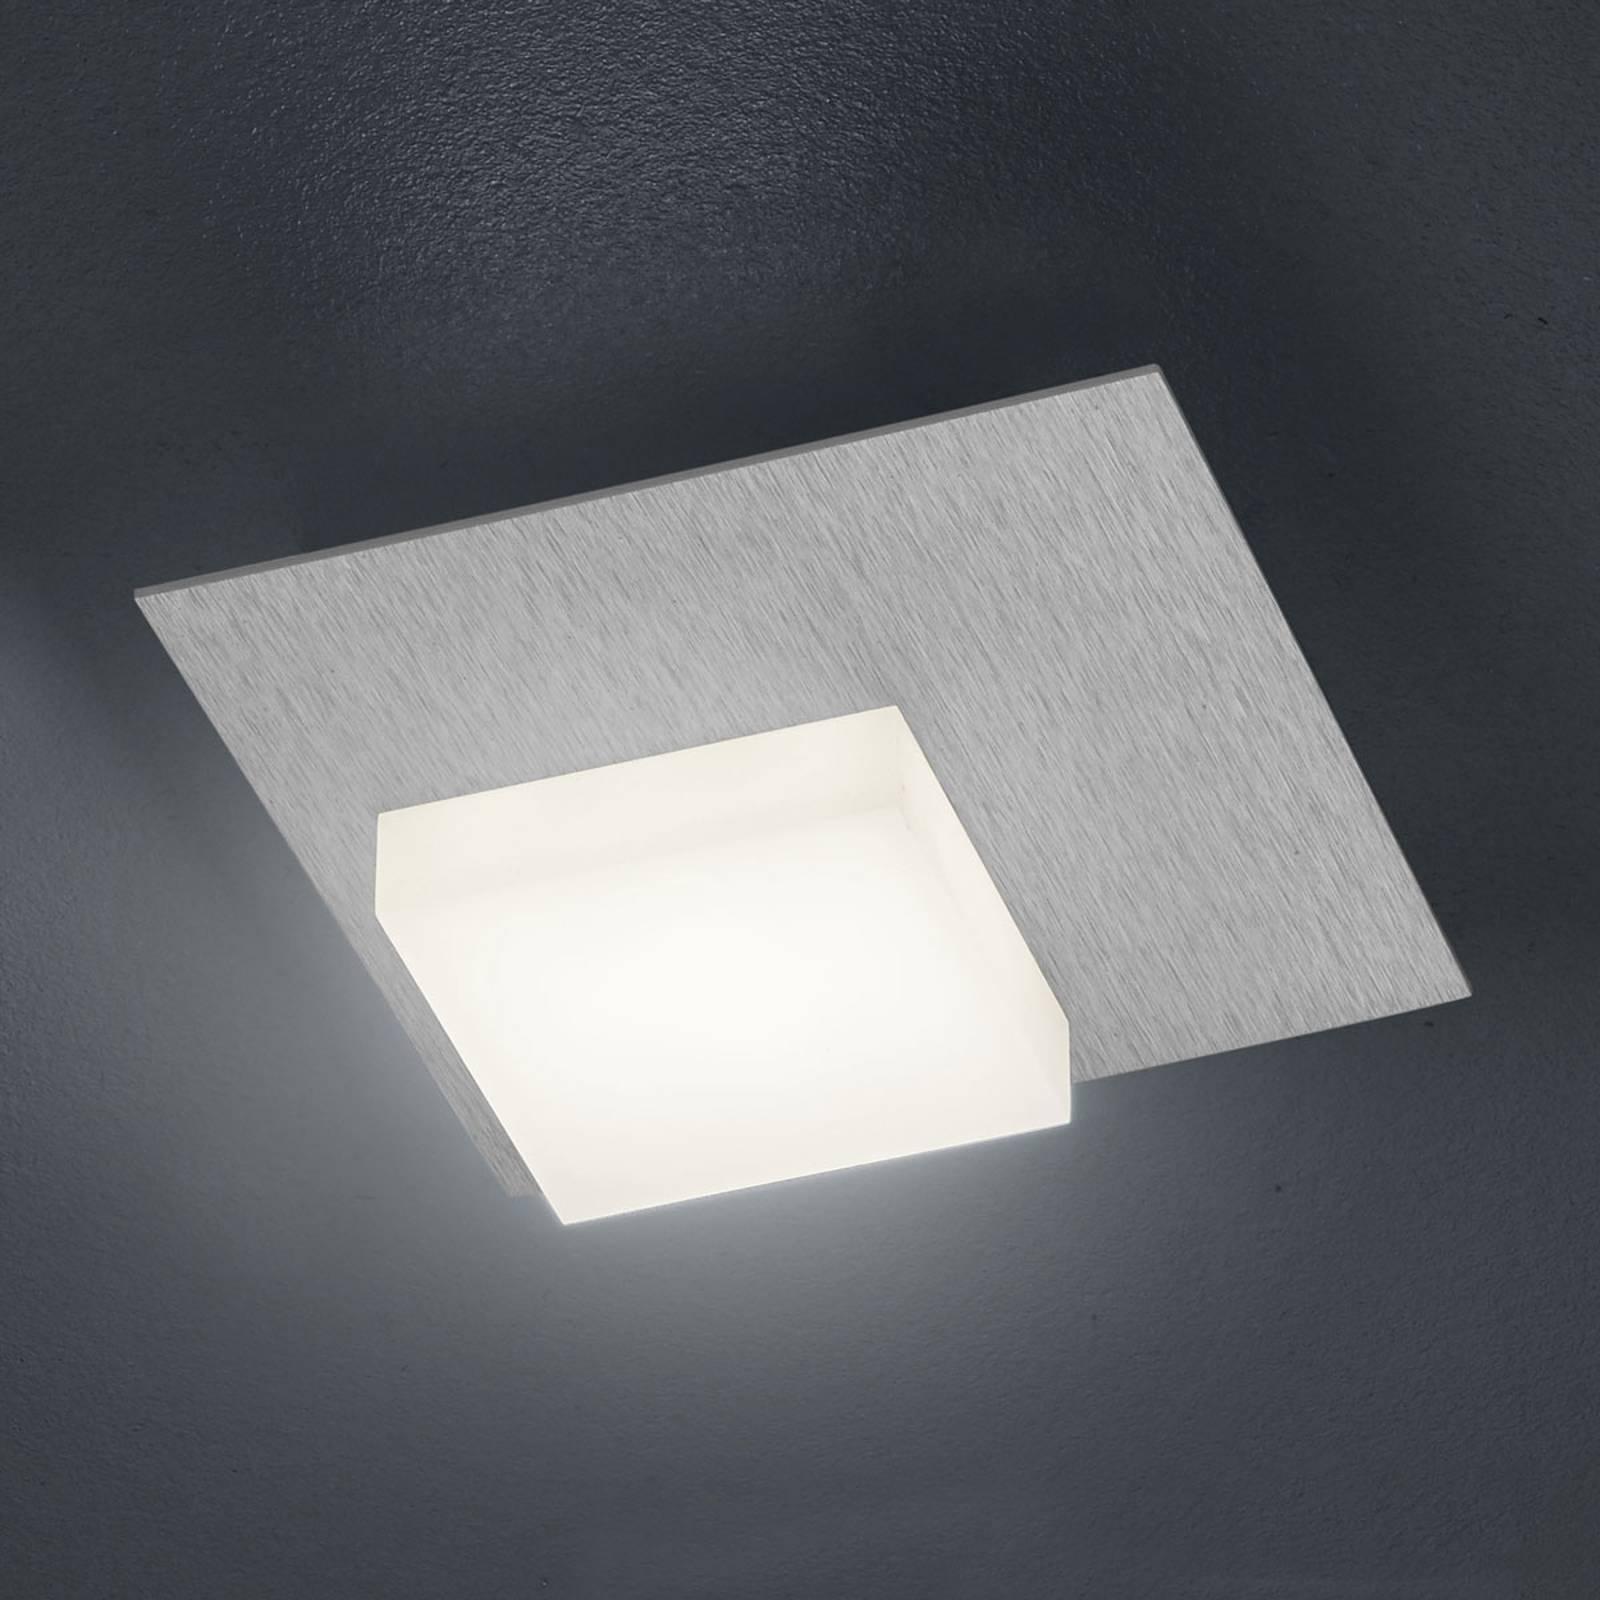 BANKAMP Cube LED-kattovalaisin 8W, hopea